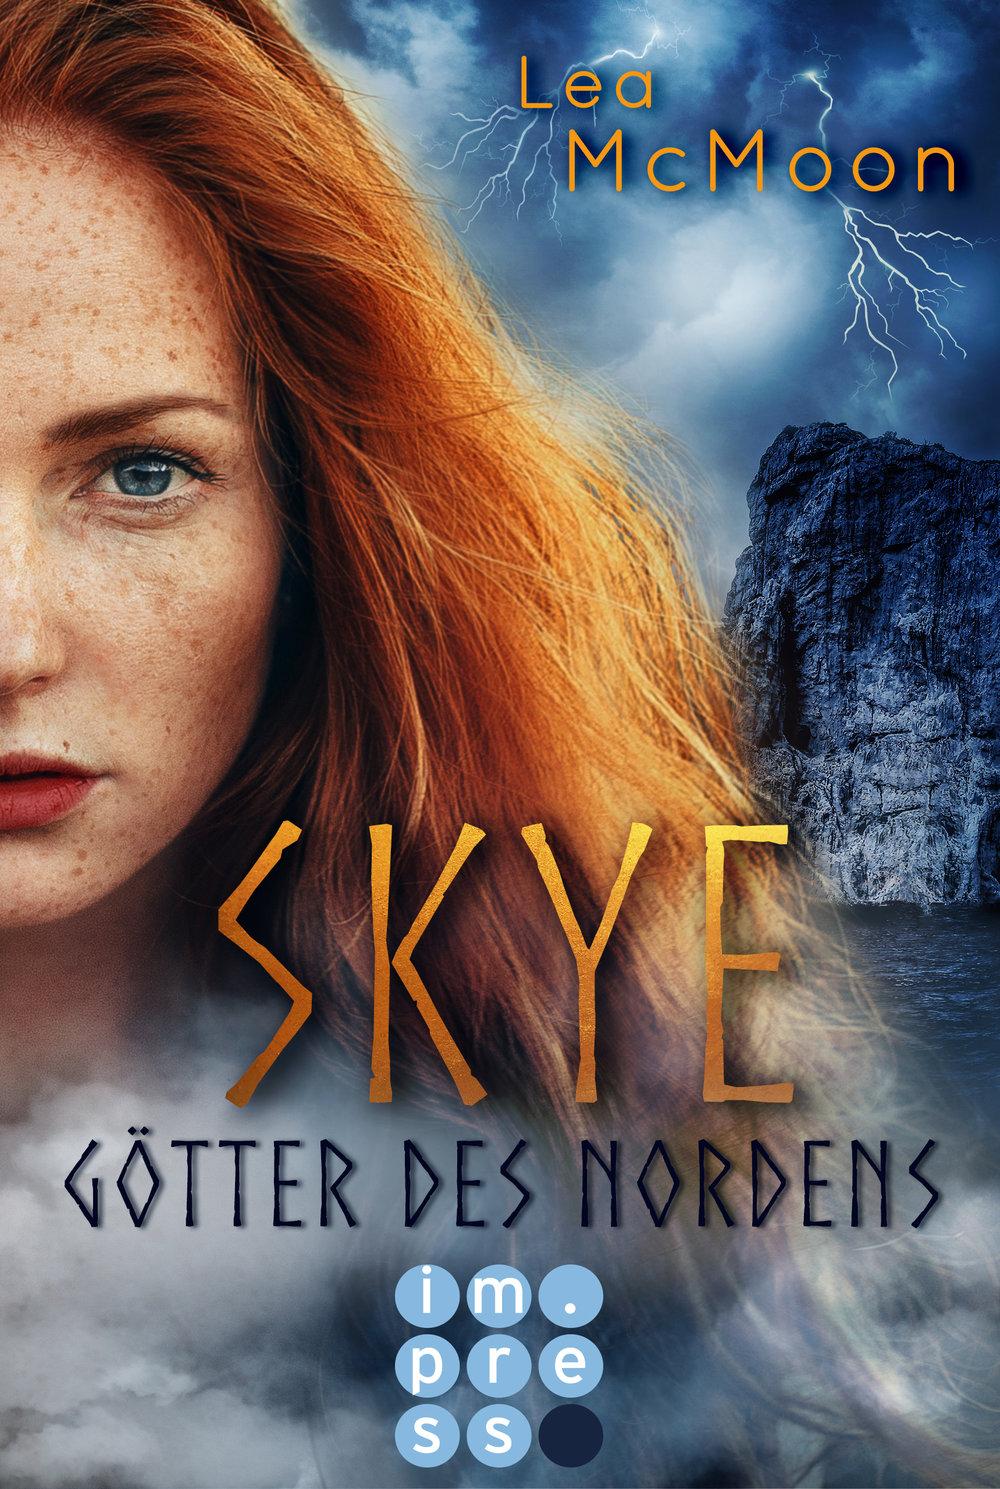 Skye-Goetter-des-Nordens_Lea-McMoon.jpg